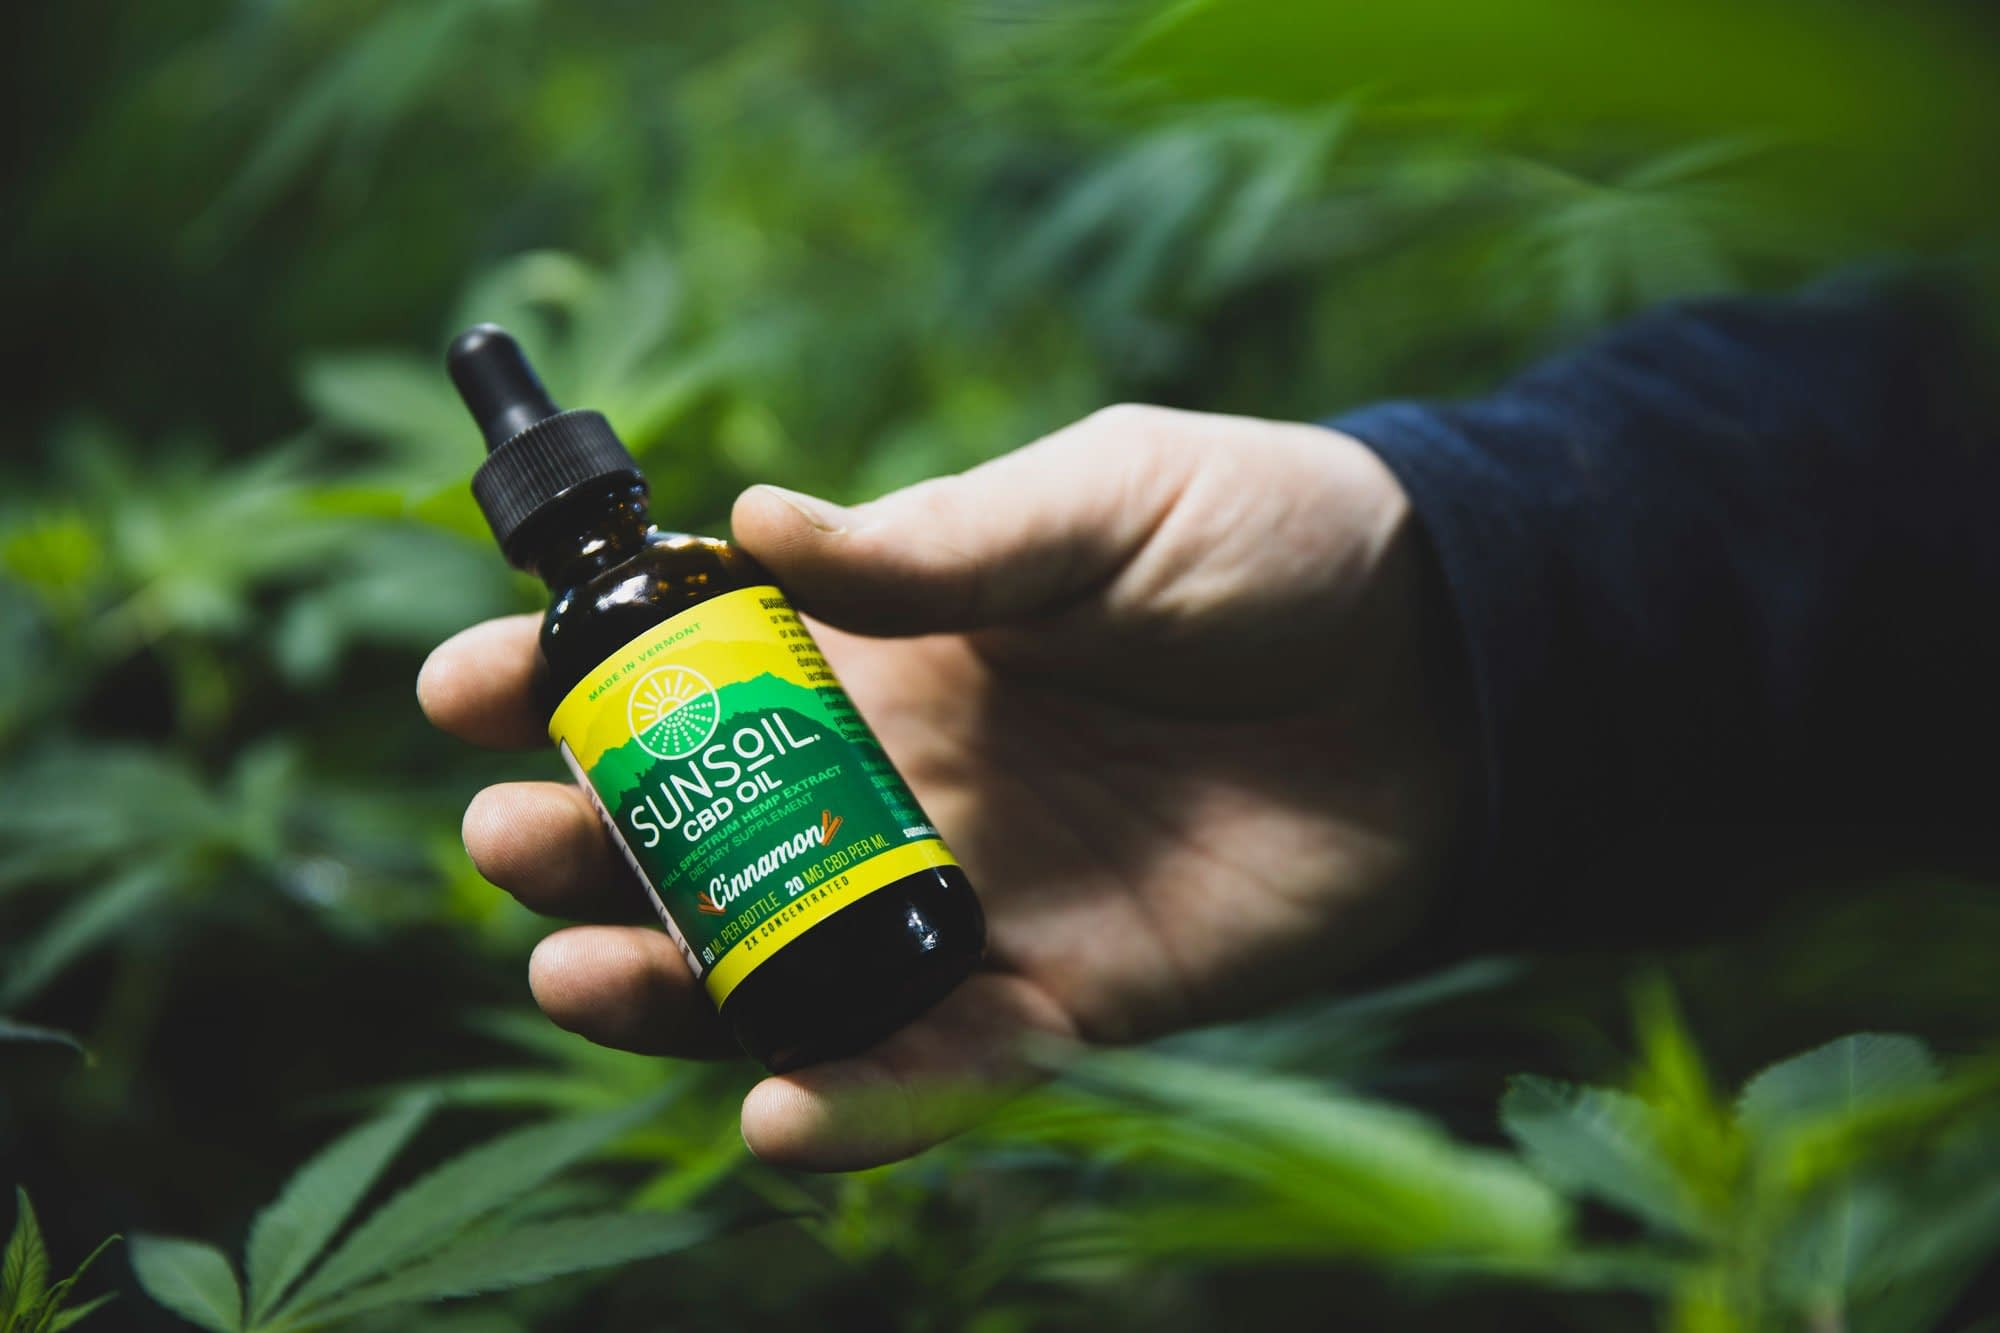 Social Media Marketing For The Cannabis/CBD Industry 2020